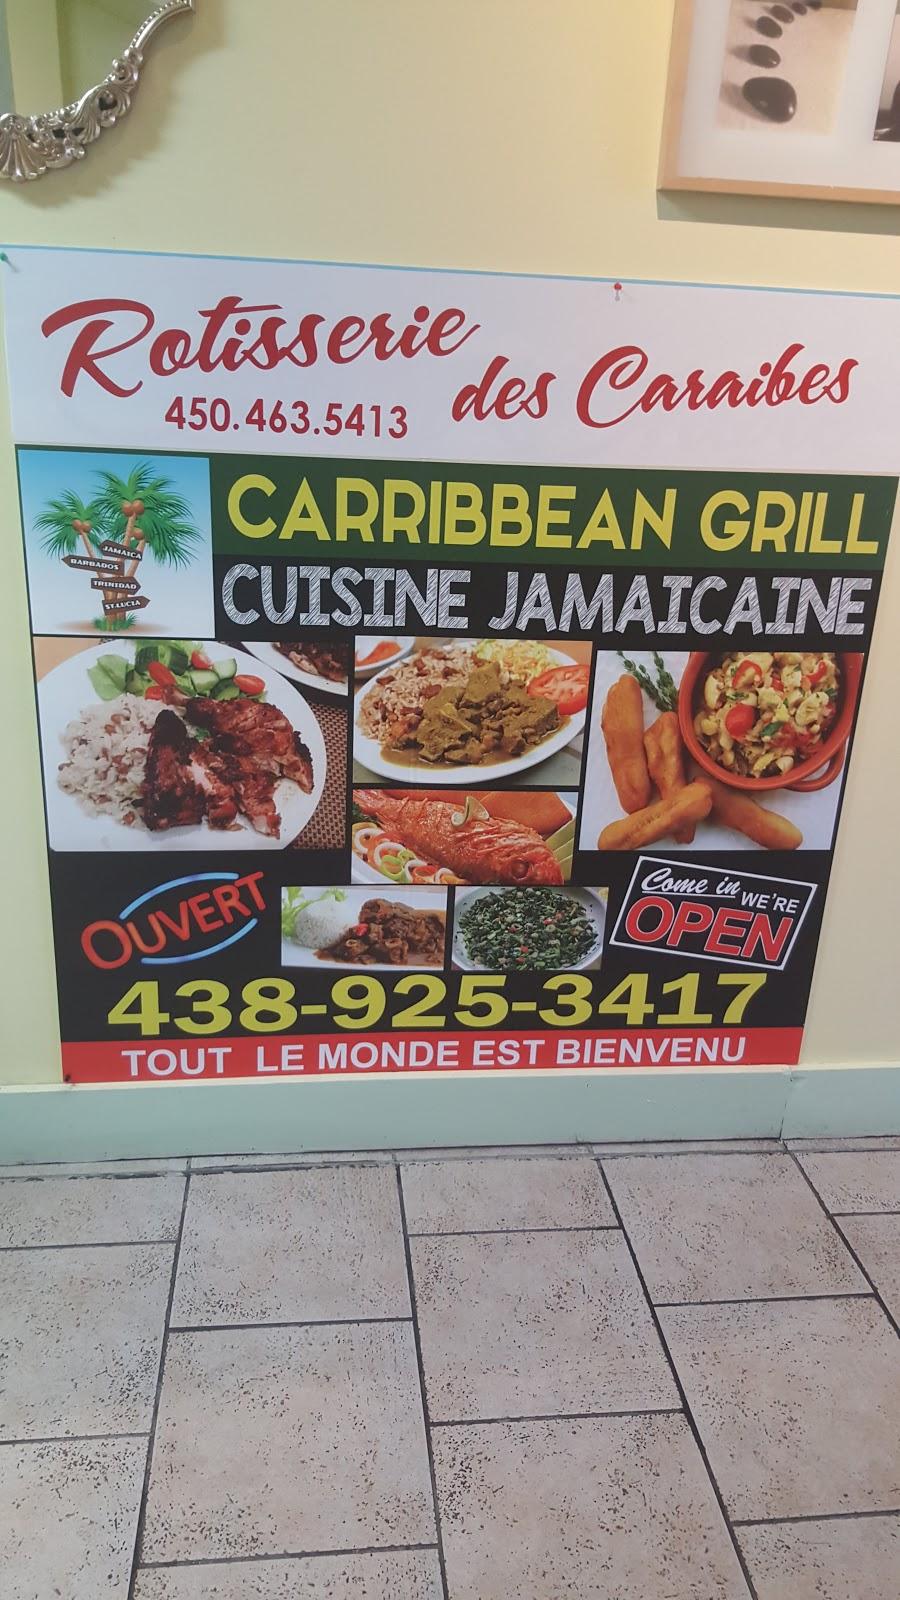 Caribbean Grill/Rotisserie Caraïbes Jamaïcaines | restaurant | 1999 Boulevard Édouard, Saint-Hubert, QC J4T 1Z3, Canada | 4389253417 OR +1 438-925-3417